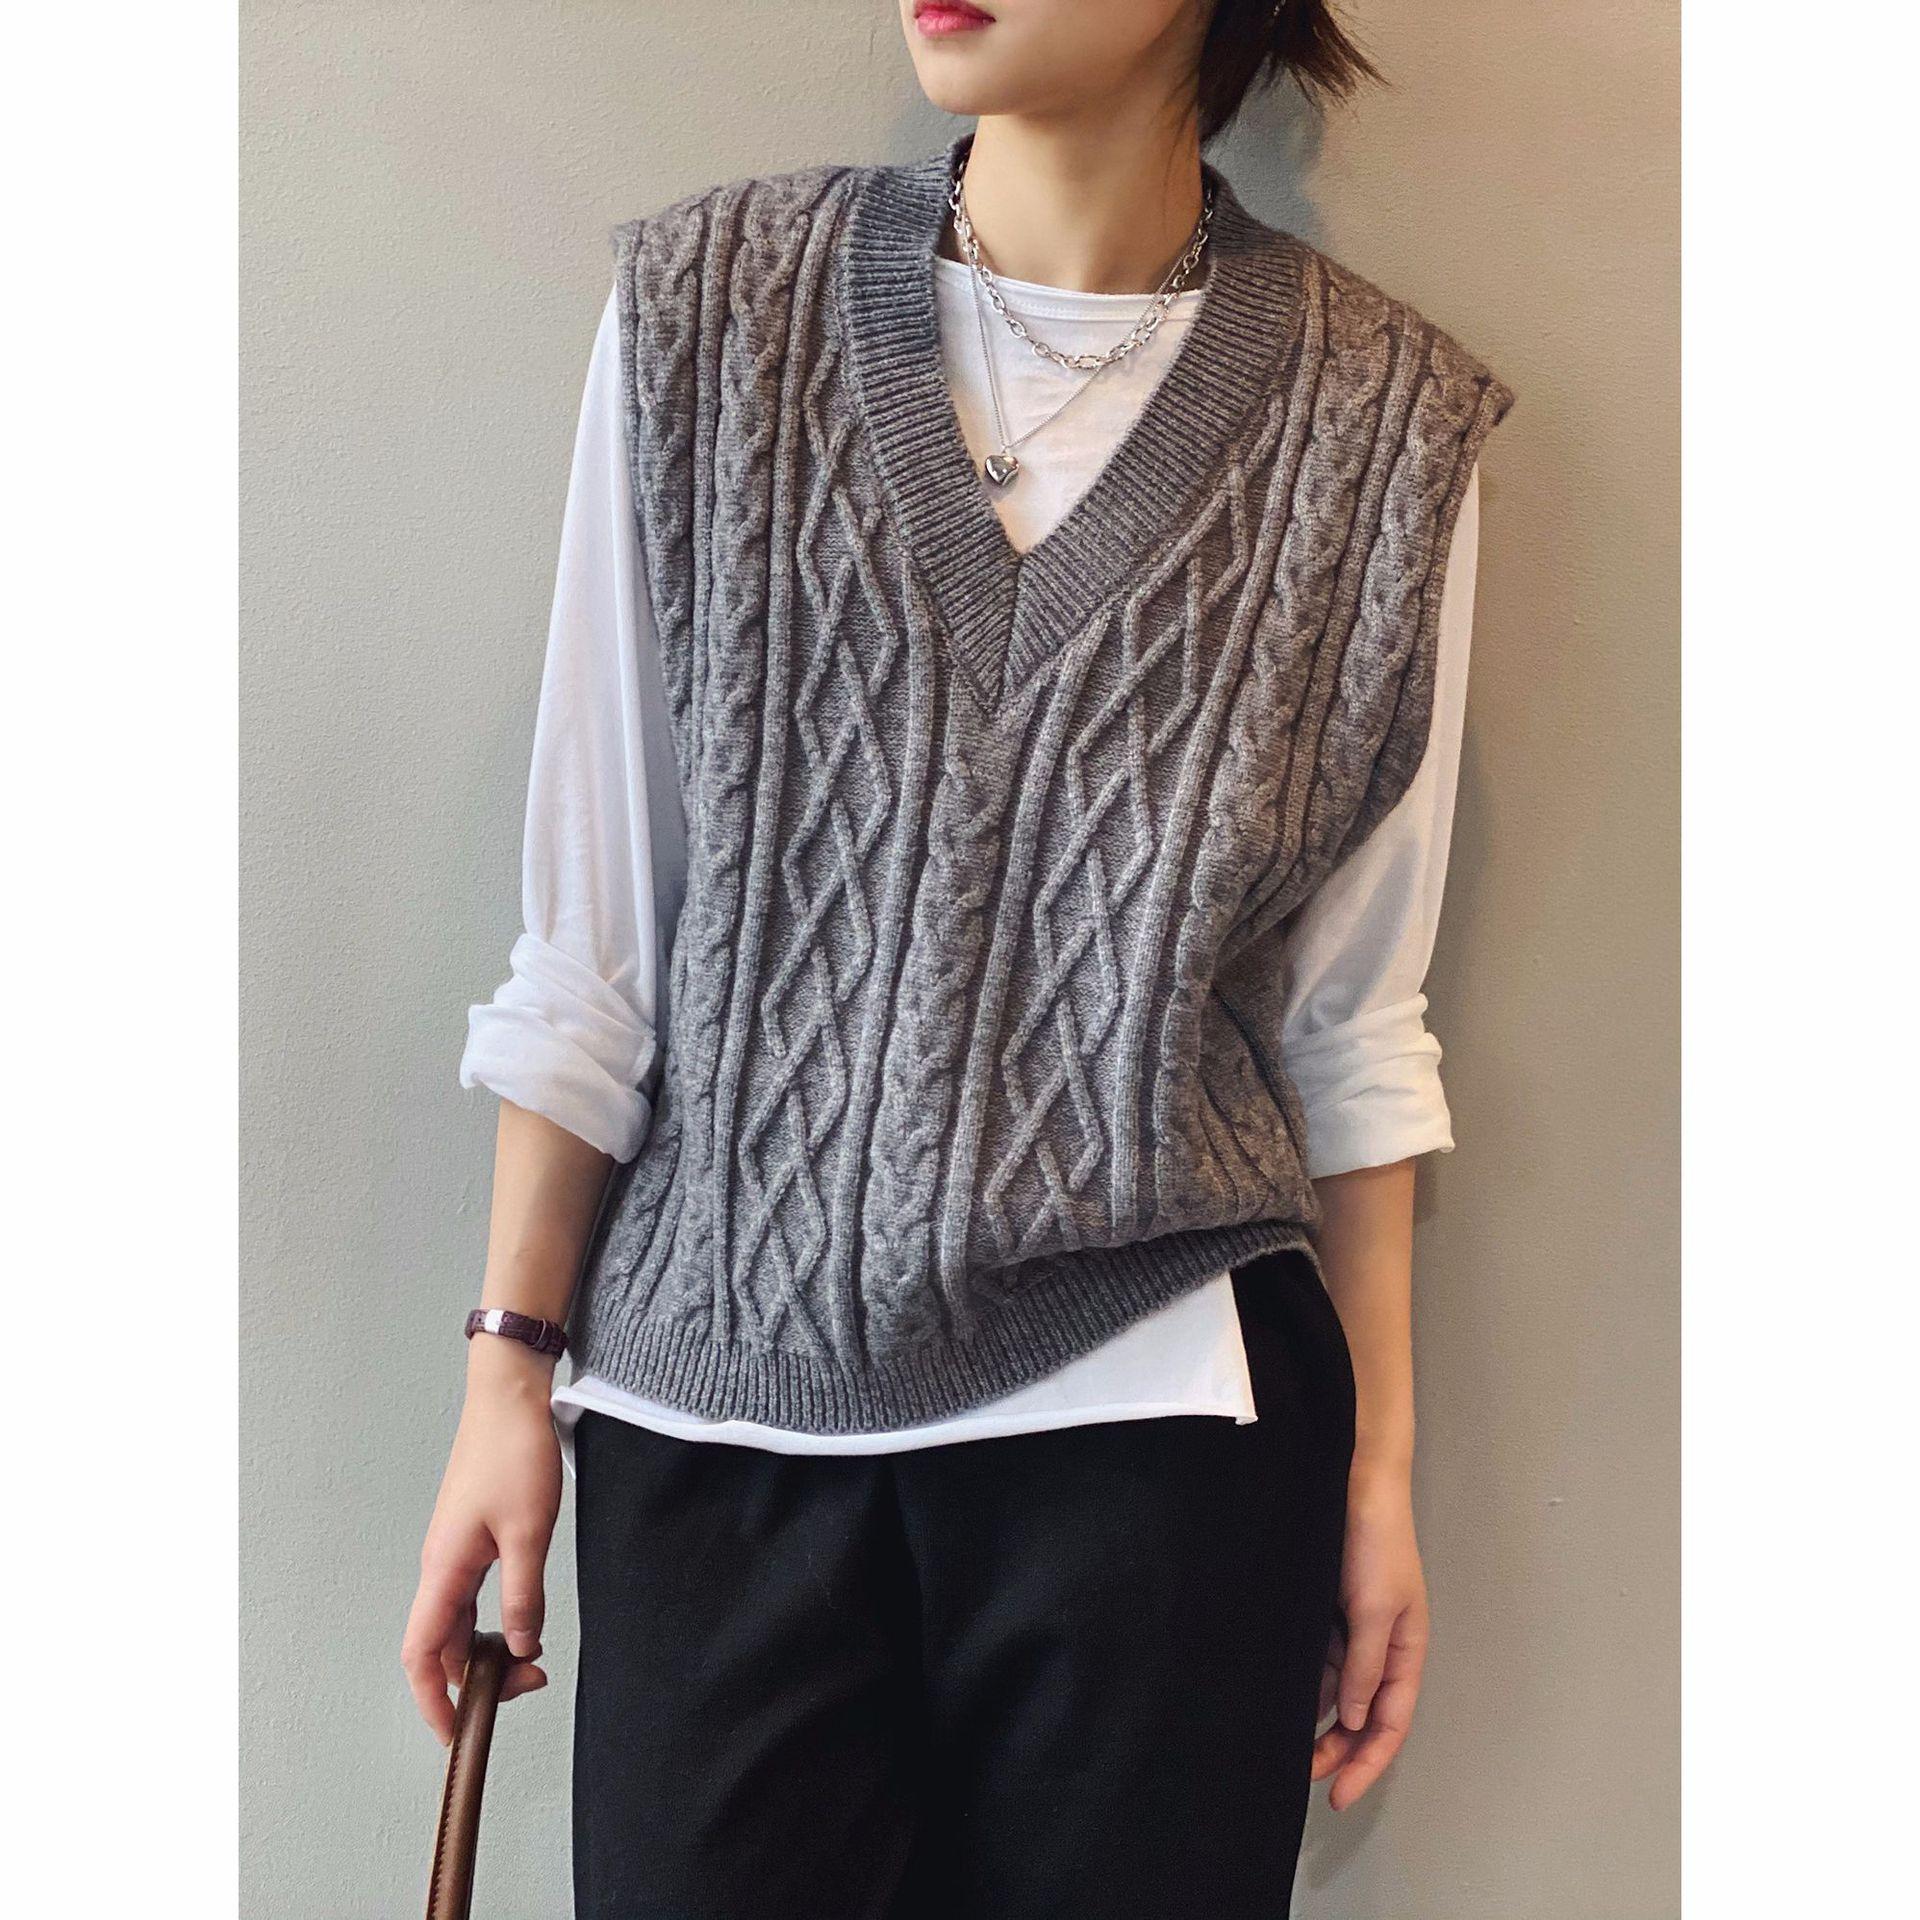 Sweater Vest Women Casual Twist Knitted Sweater V-Neck Loose Sleeveless Korean Style Women Clothes Harajuku Waistcoat T3335